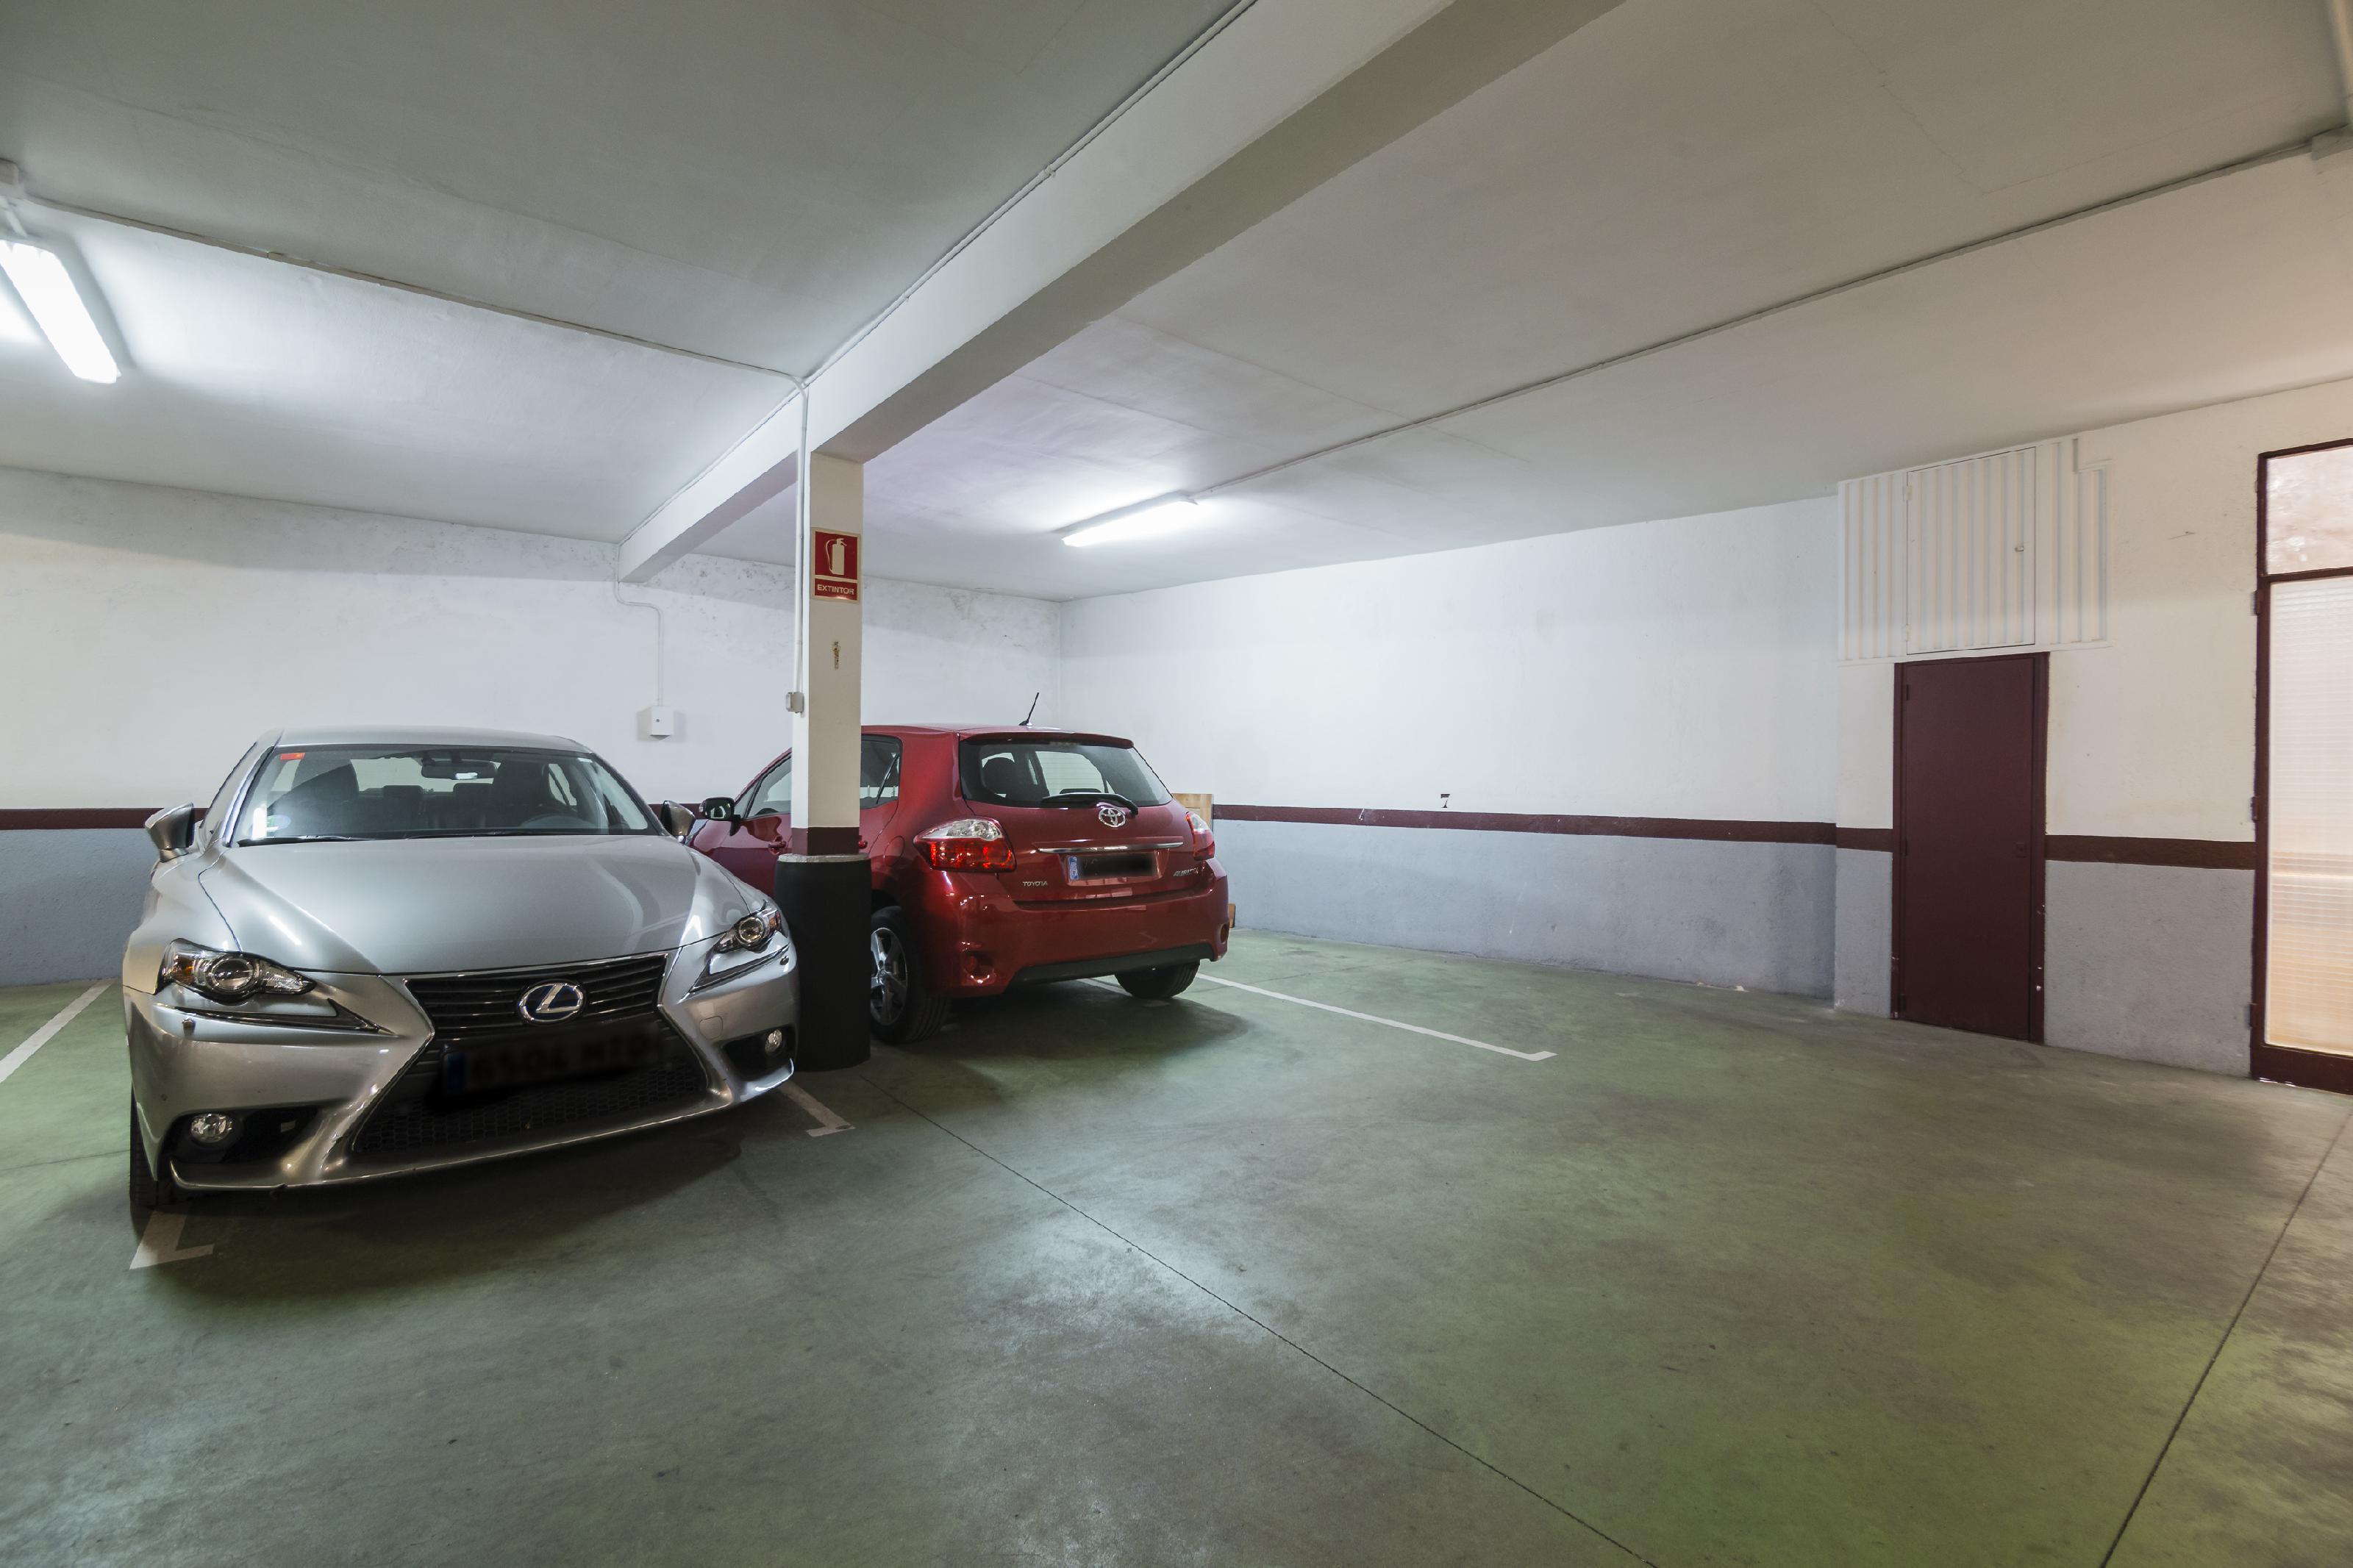 249856 Flat for sale in Sarrià-Sant Gervasi, Sant Gervasi-Galvany 34